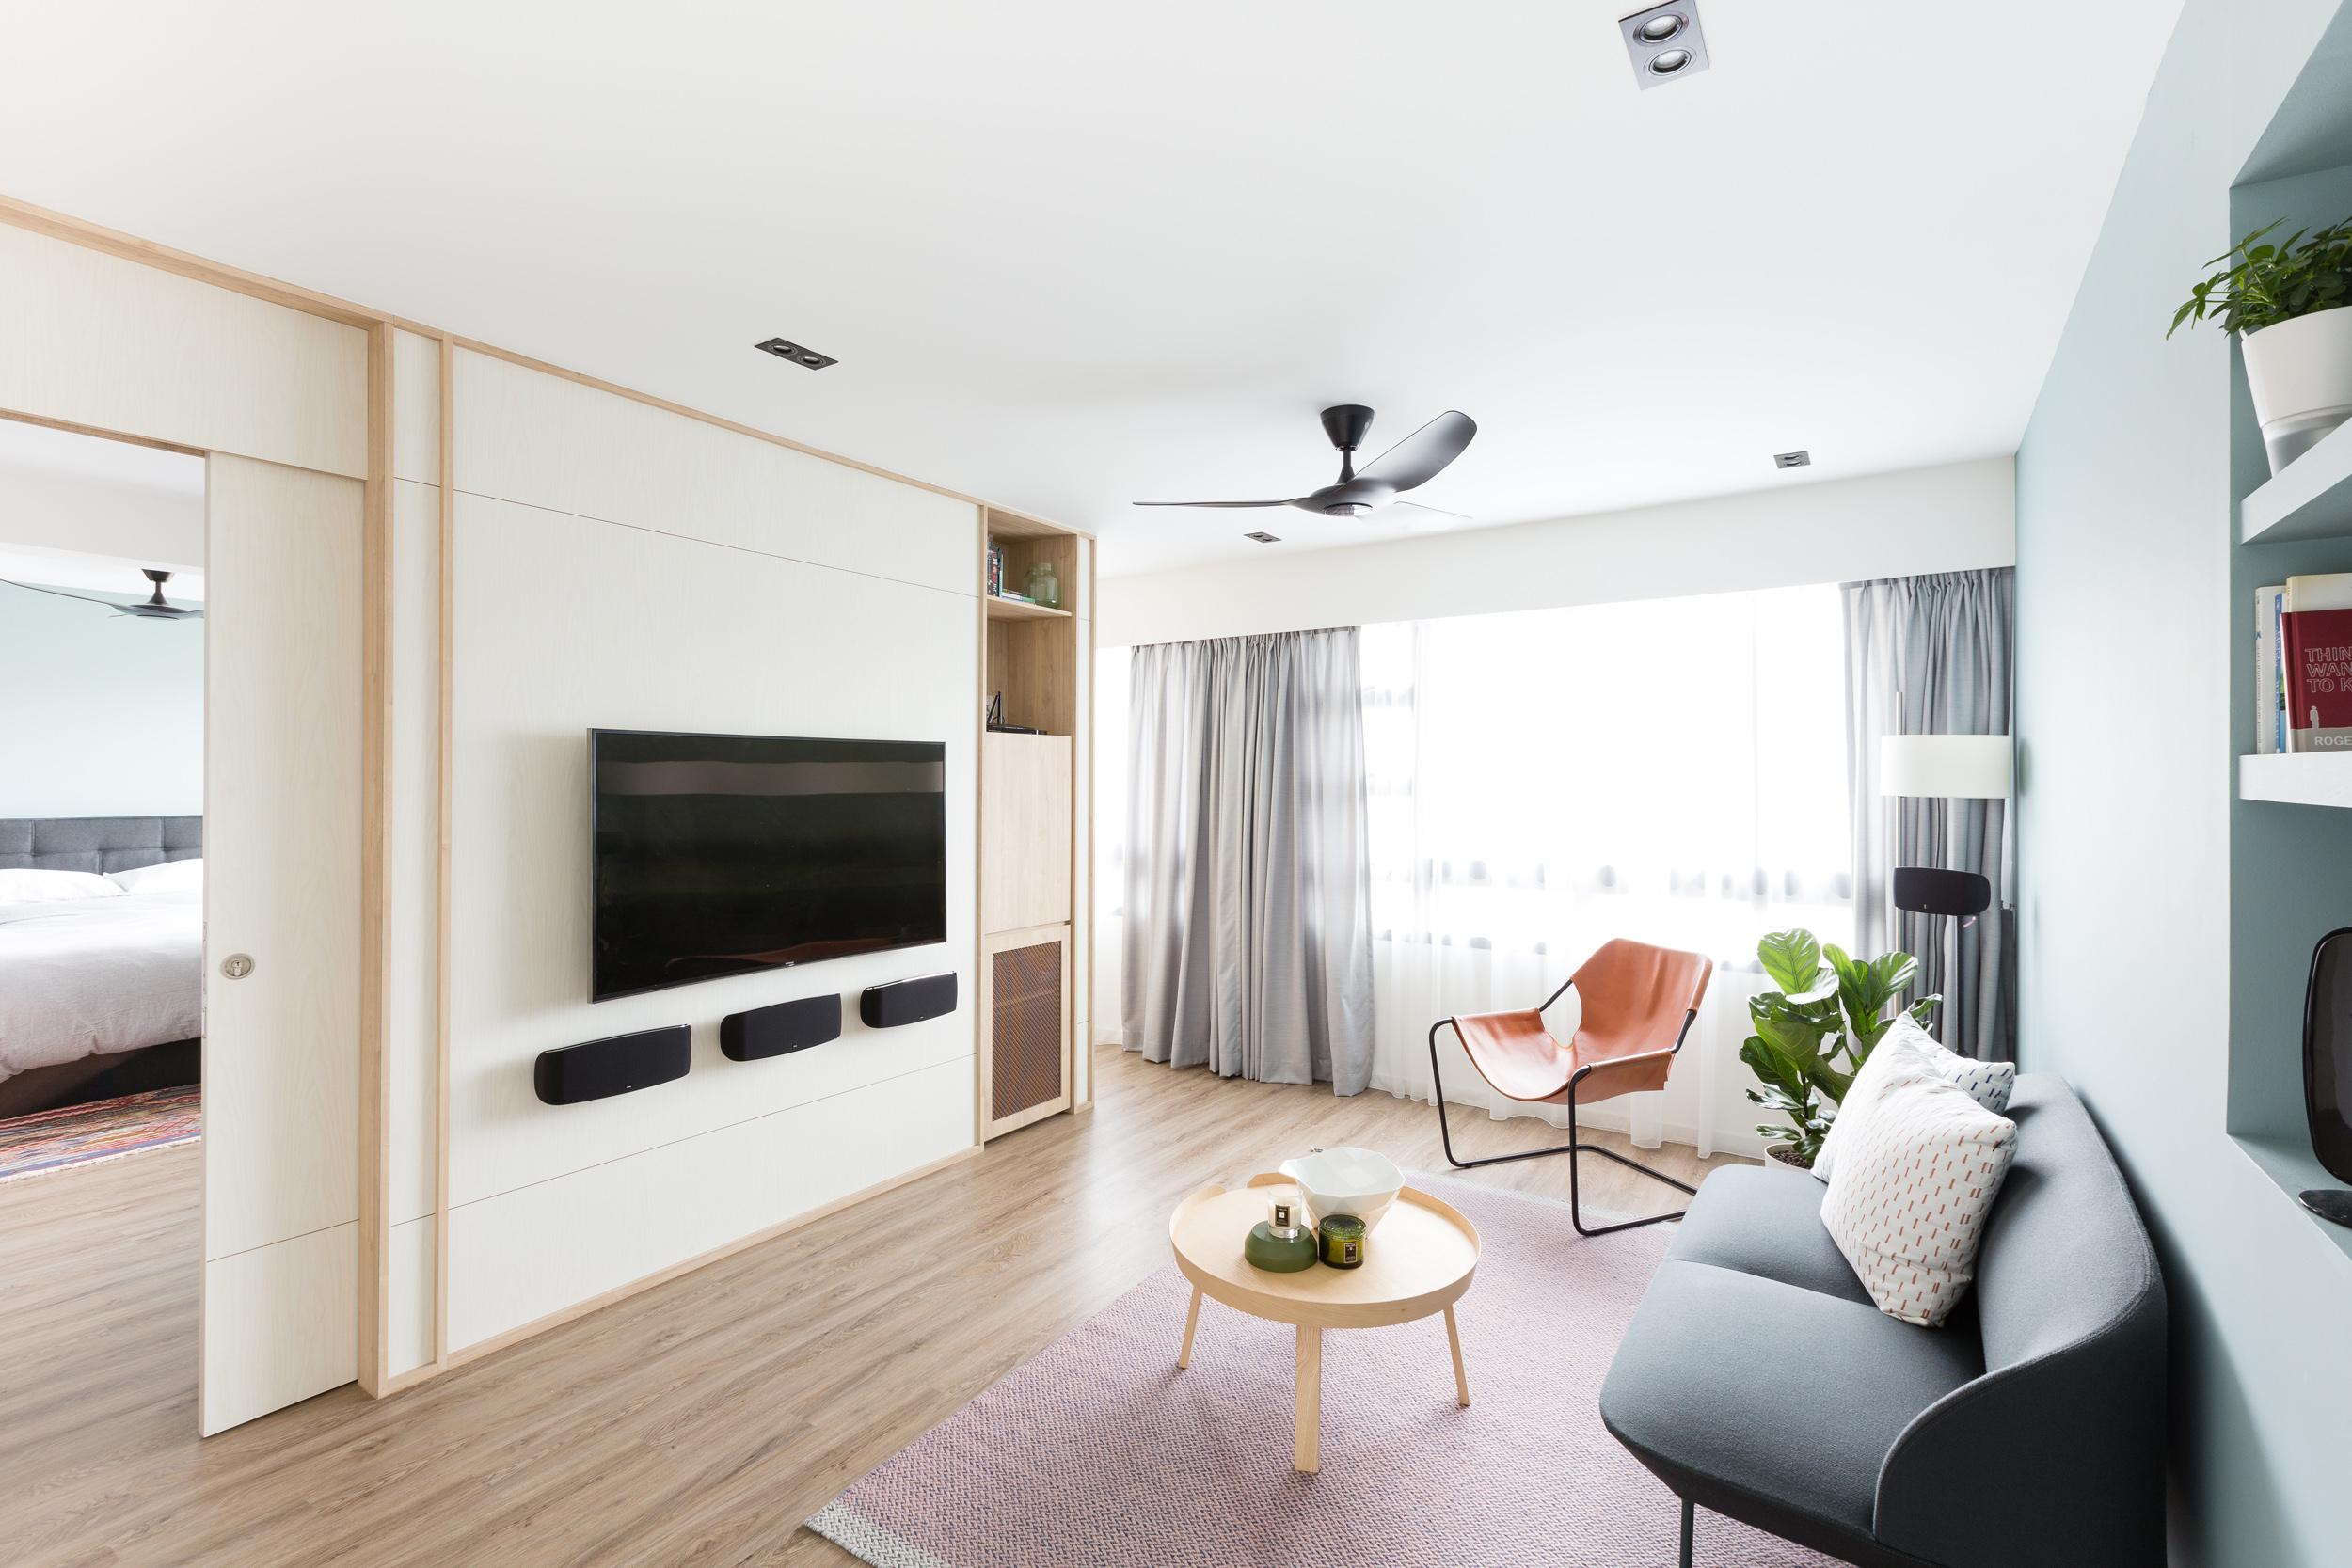 singapore-interiors-photographer-zainal-zainal-studio-01.jpg